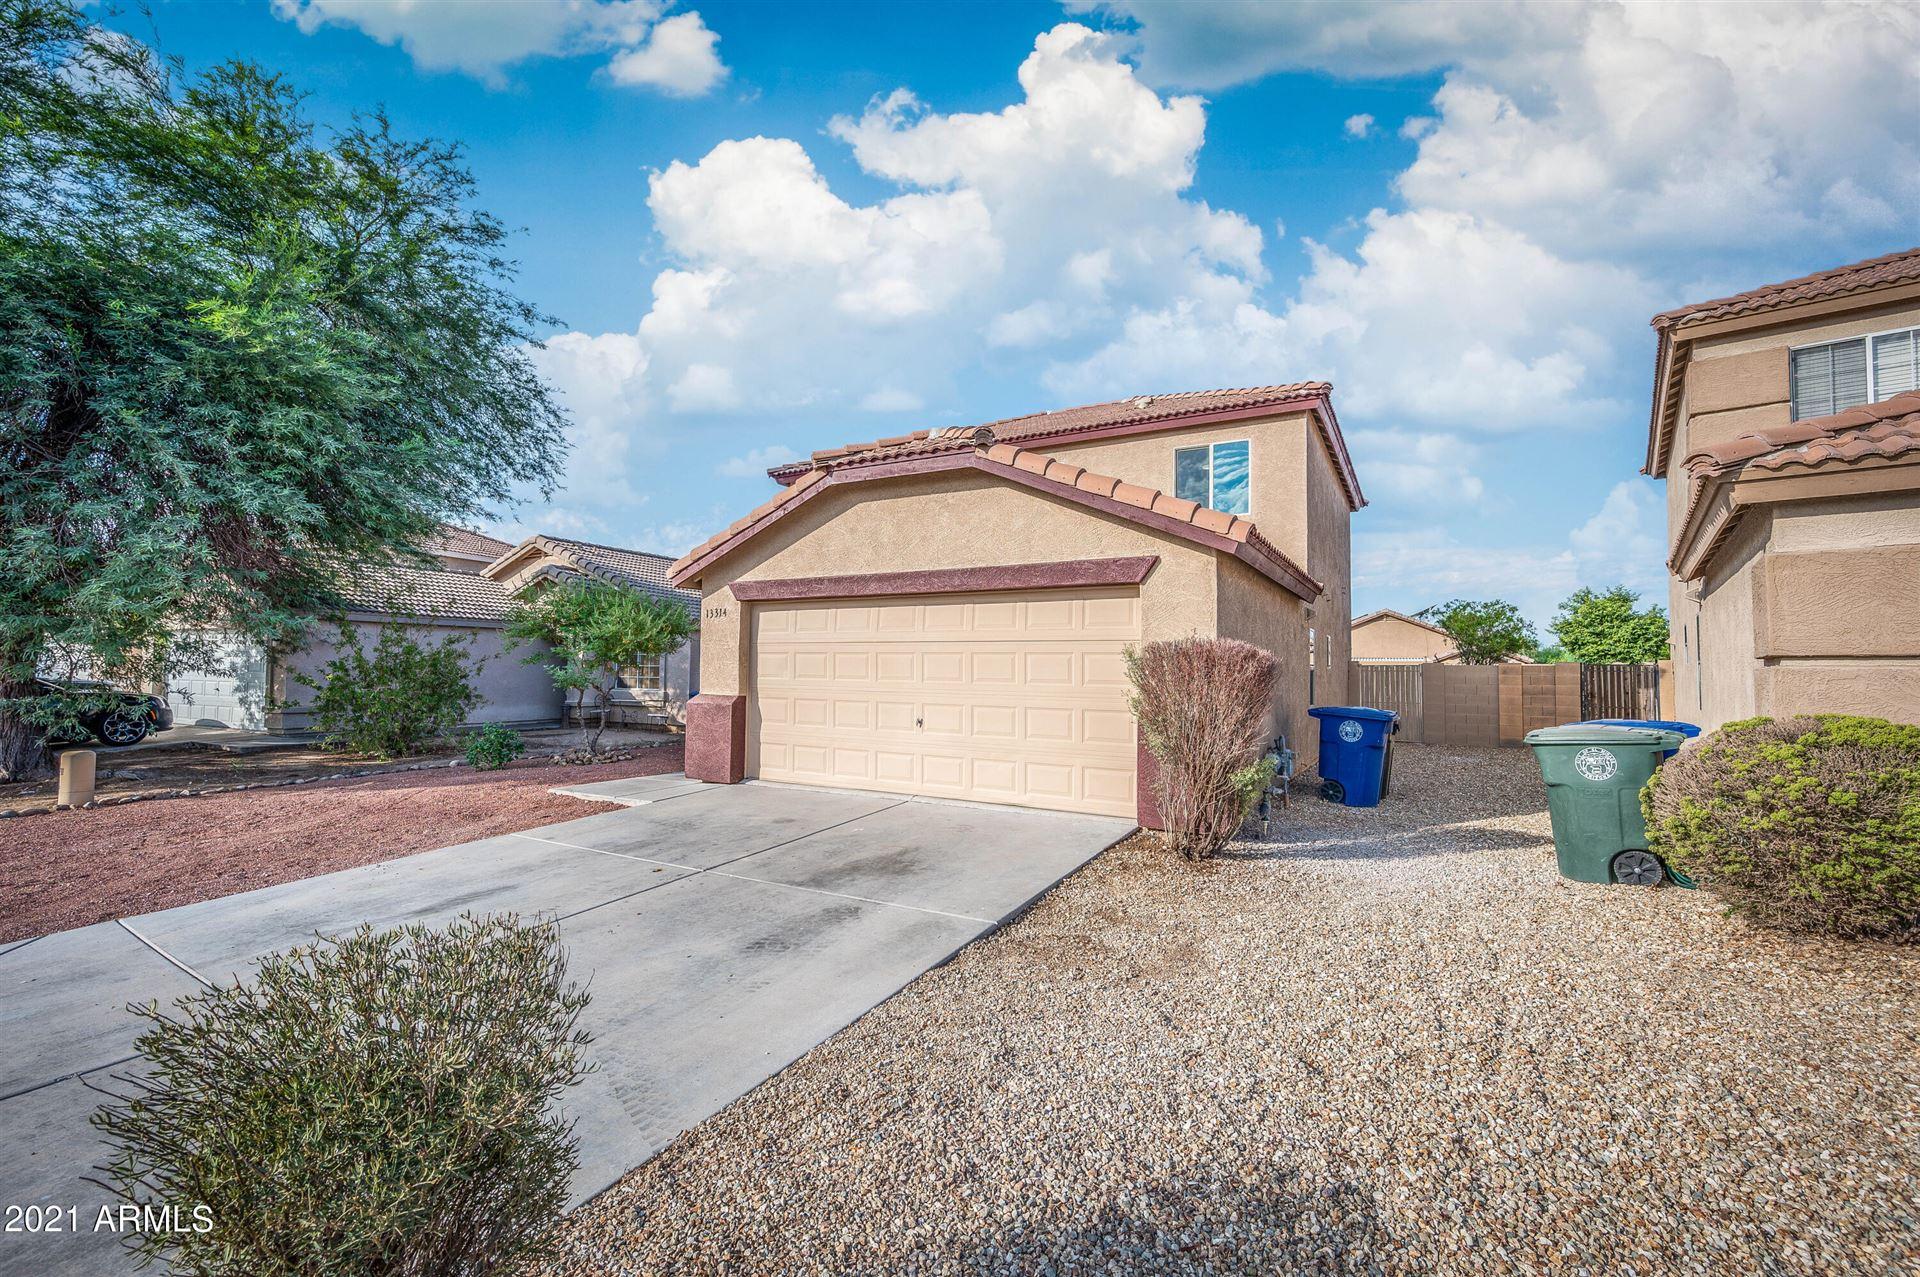 Photo of 13314 N 126TH Avenue, El Mirage, AZ 85335 (MLS # 6295877)